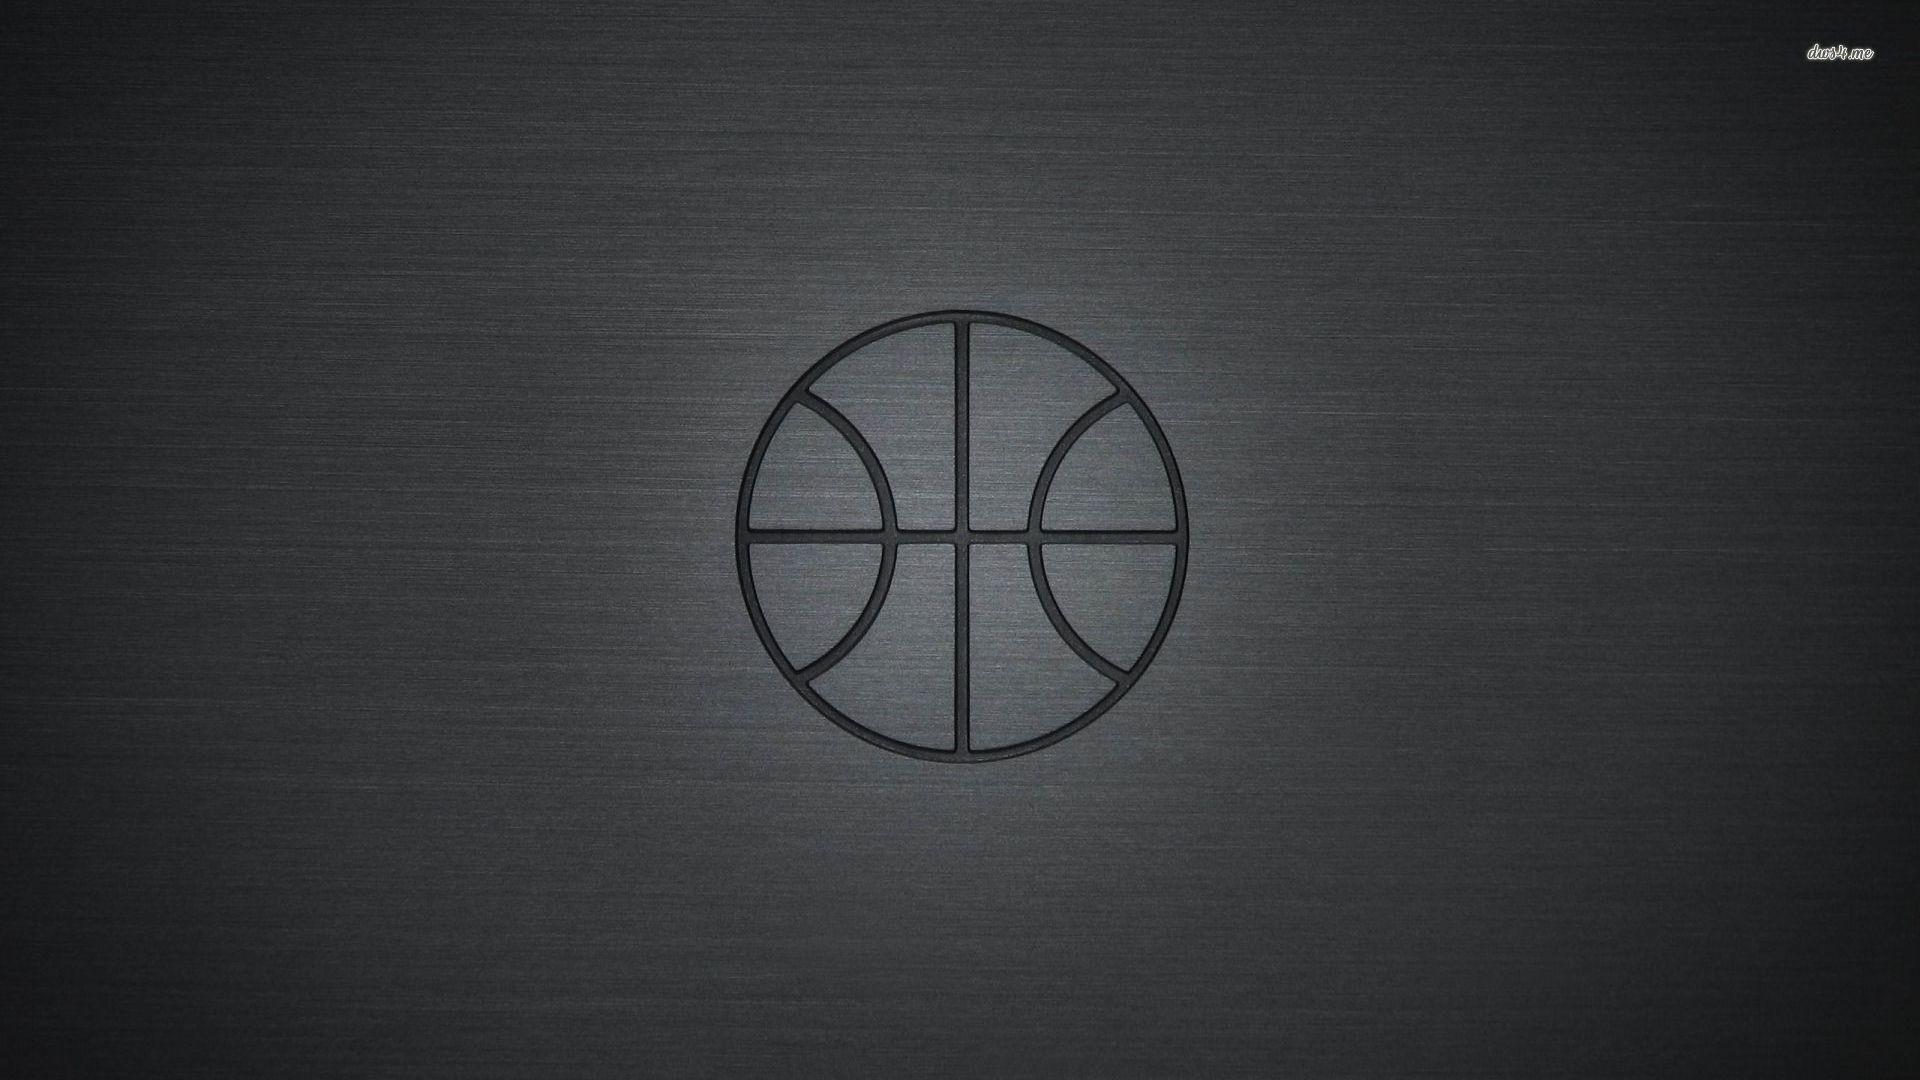 Wallpaper : Sports, Sport, Text, Logo, Simple, Circle